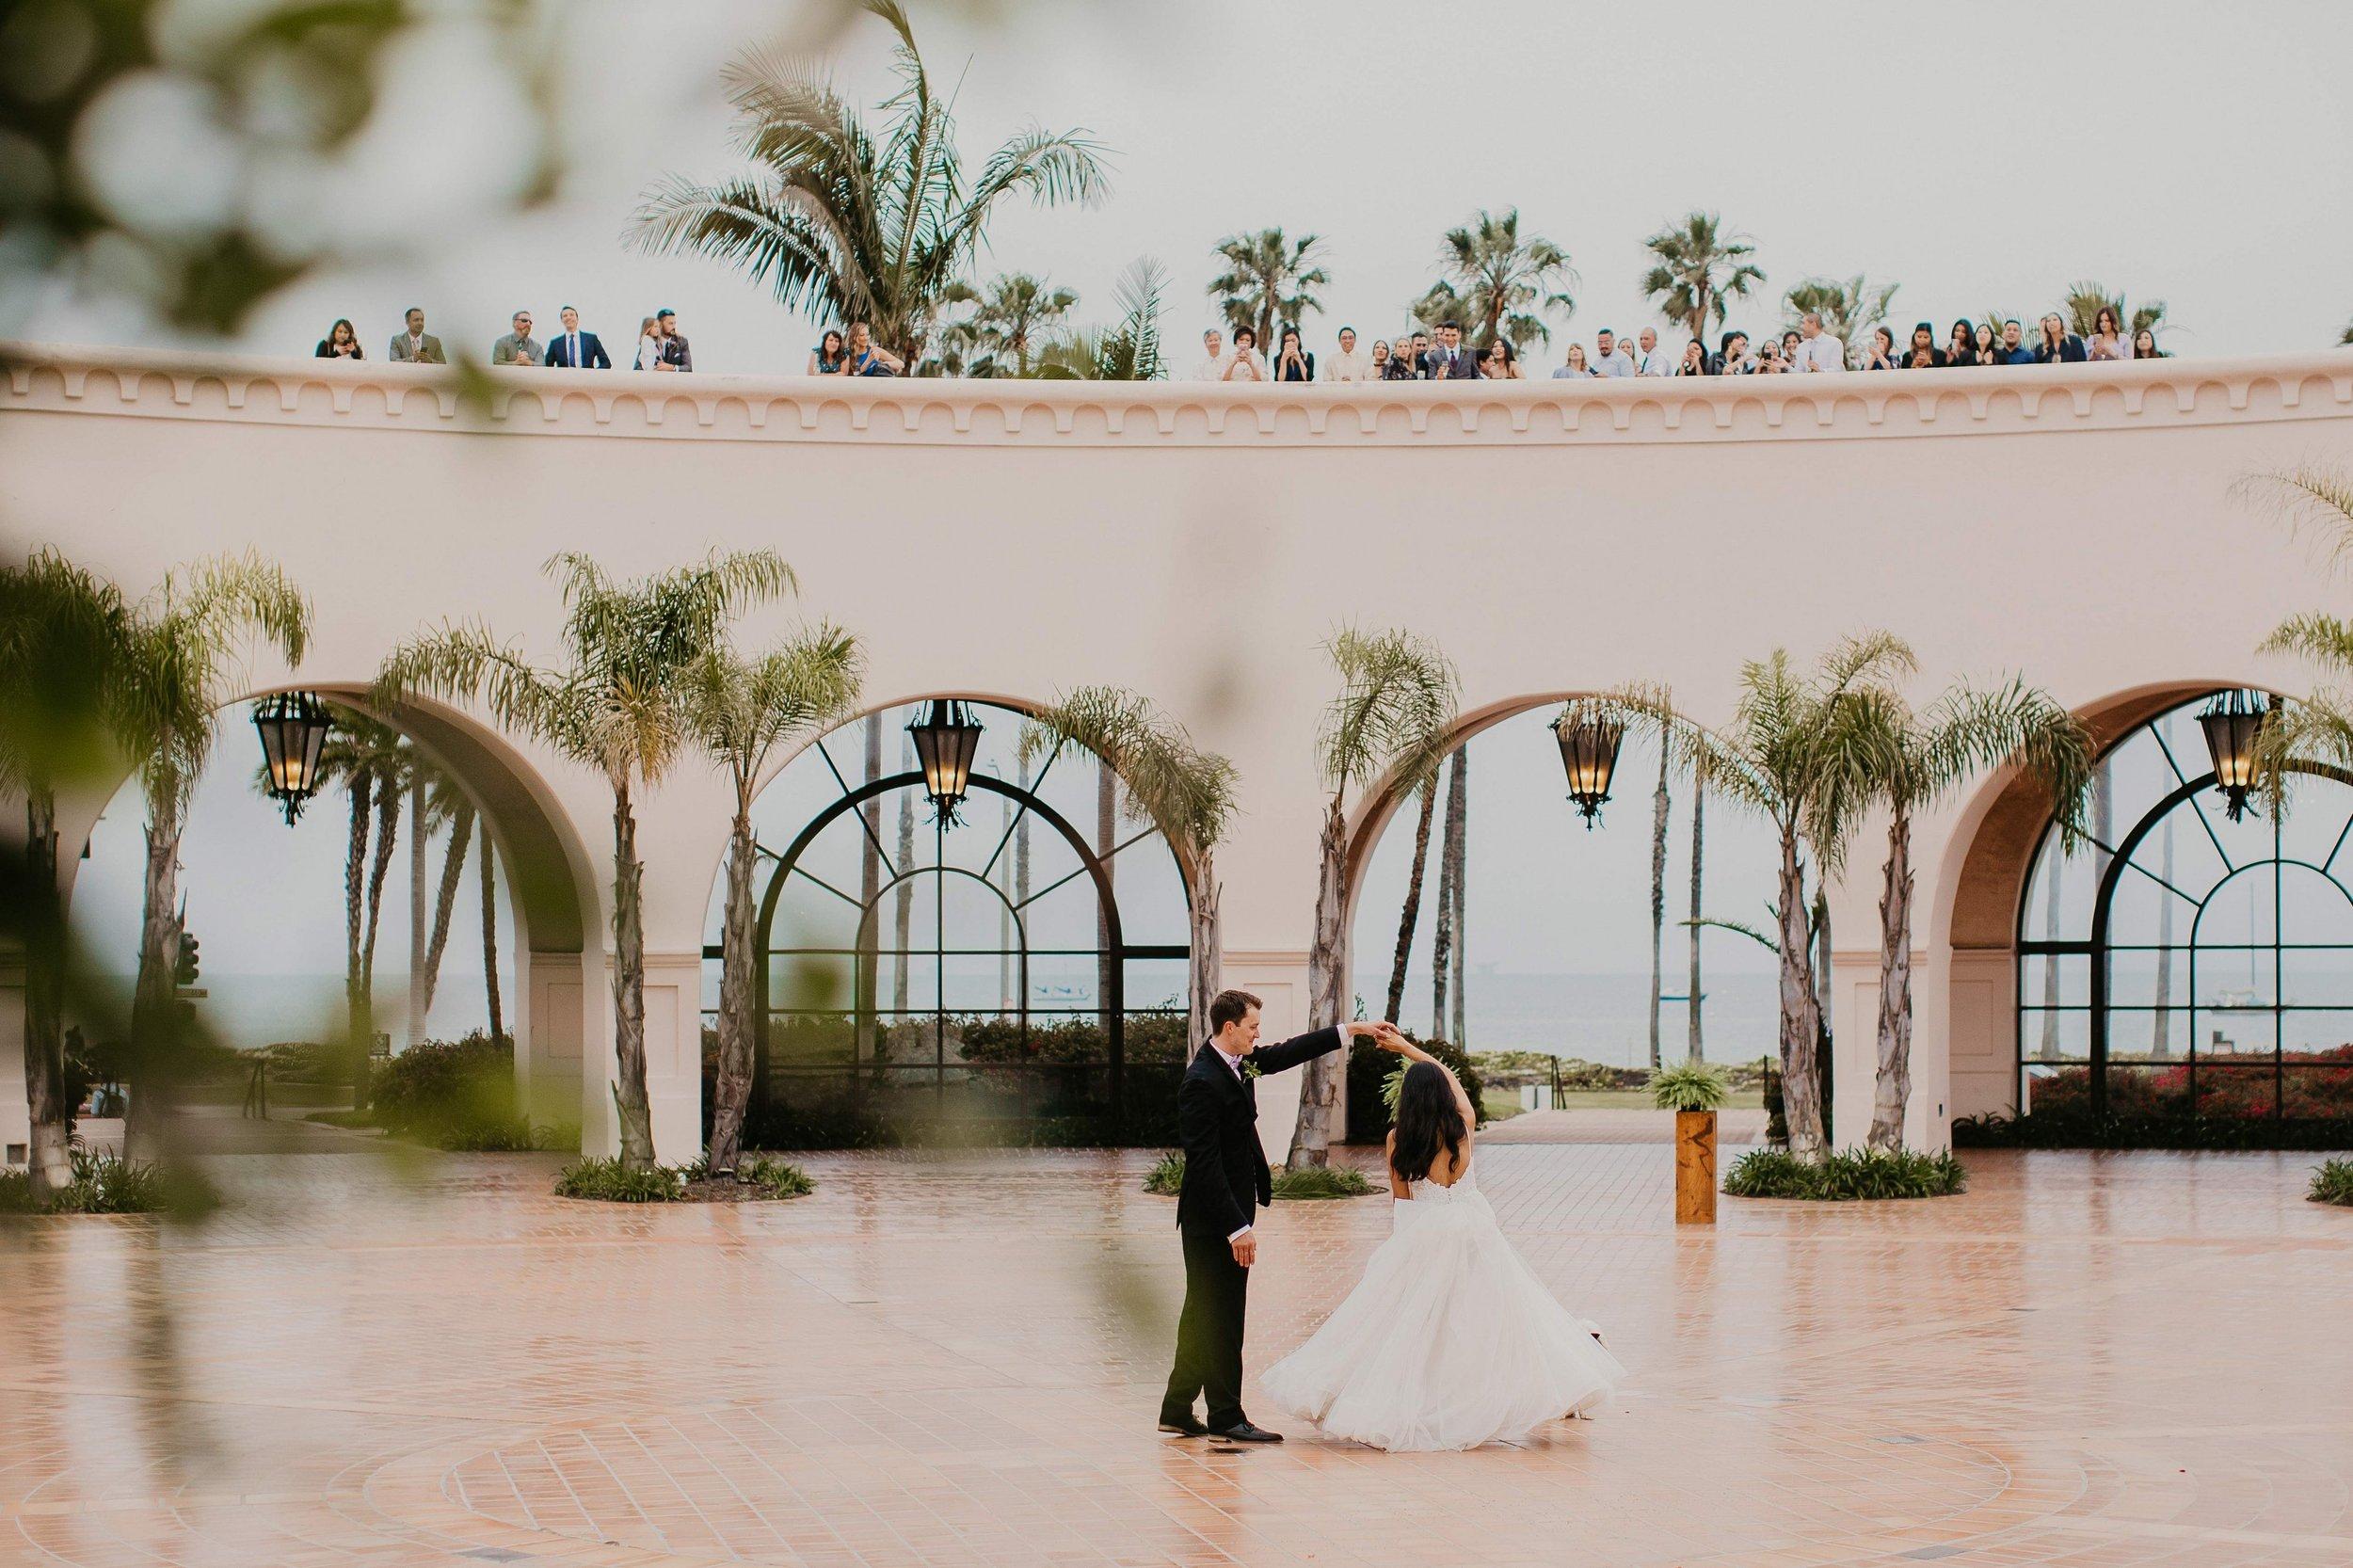 www.santabarbarawedding.com | Candice Marie Photography | Hilton Santa Barbara Beachfront Resort | Dalina Klan | Once in a Lifetime Weddings | DJ Ras | Bride and Groom Dancing